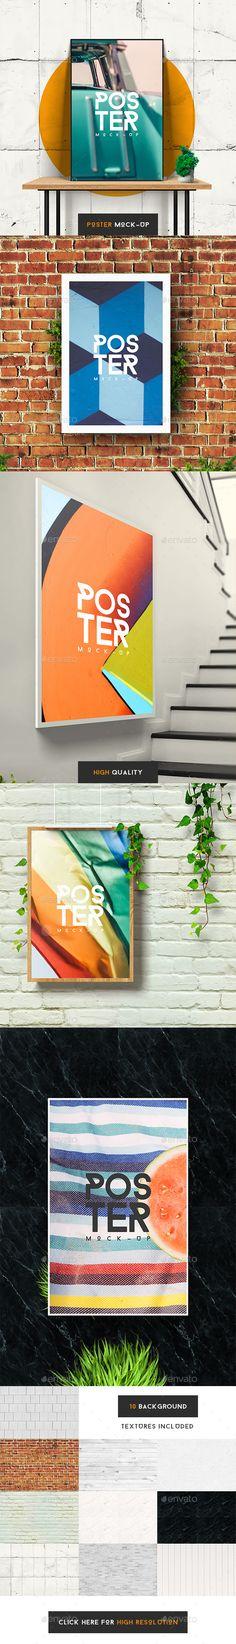 Creative Poster Mockup - Posters Print